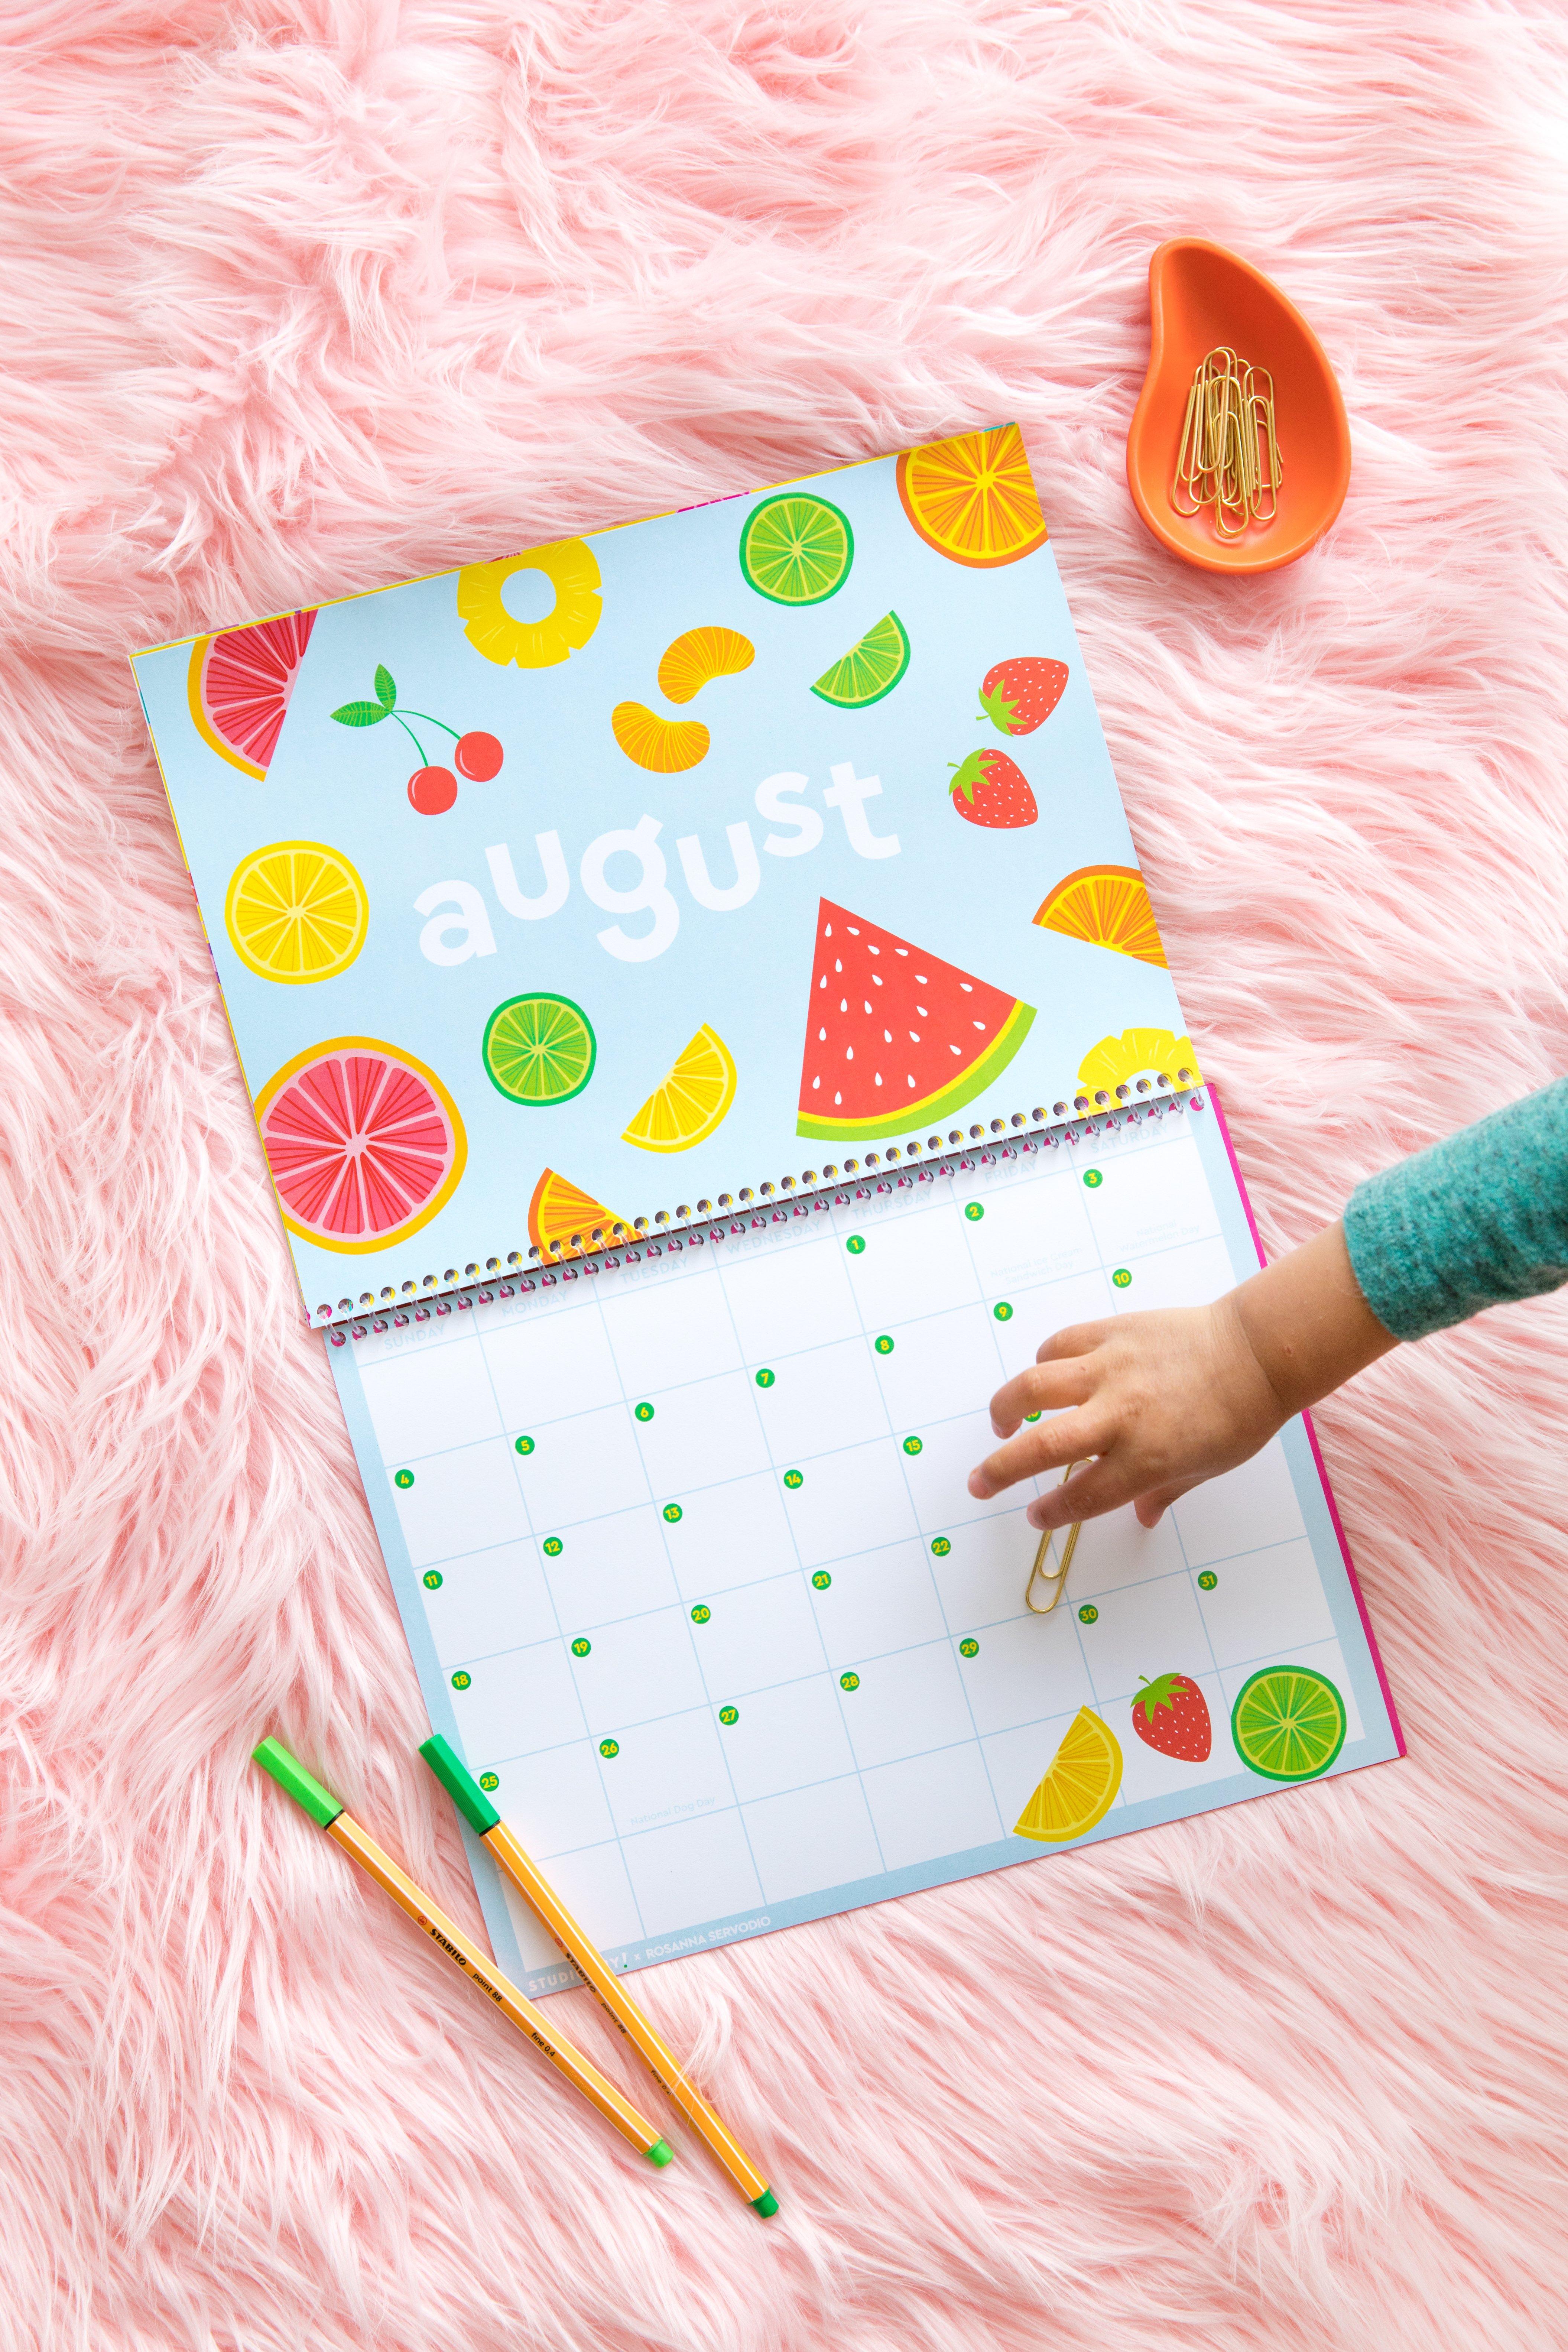 2019 Free Printable Wall Calendar - Studio Diy Calendar 2019 Diy